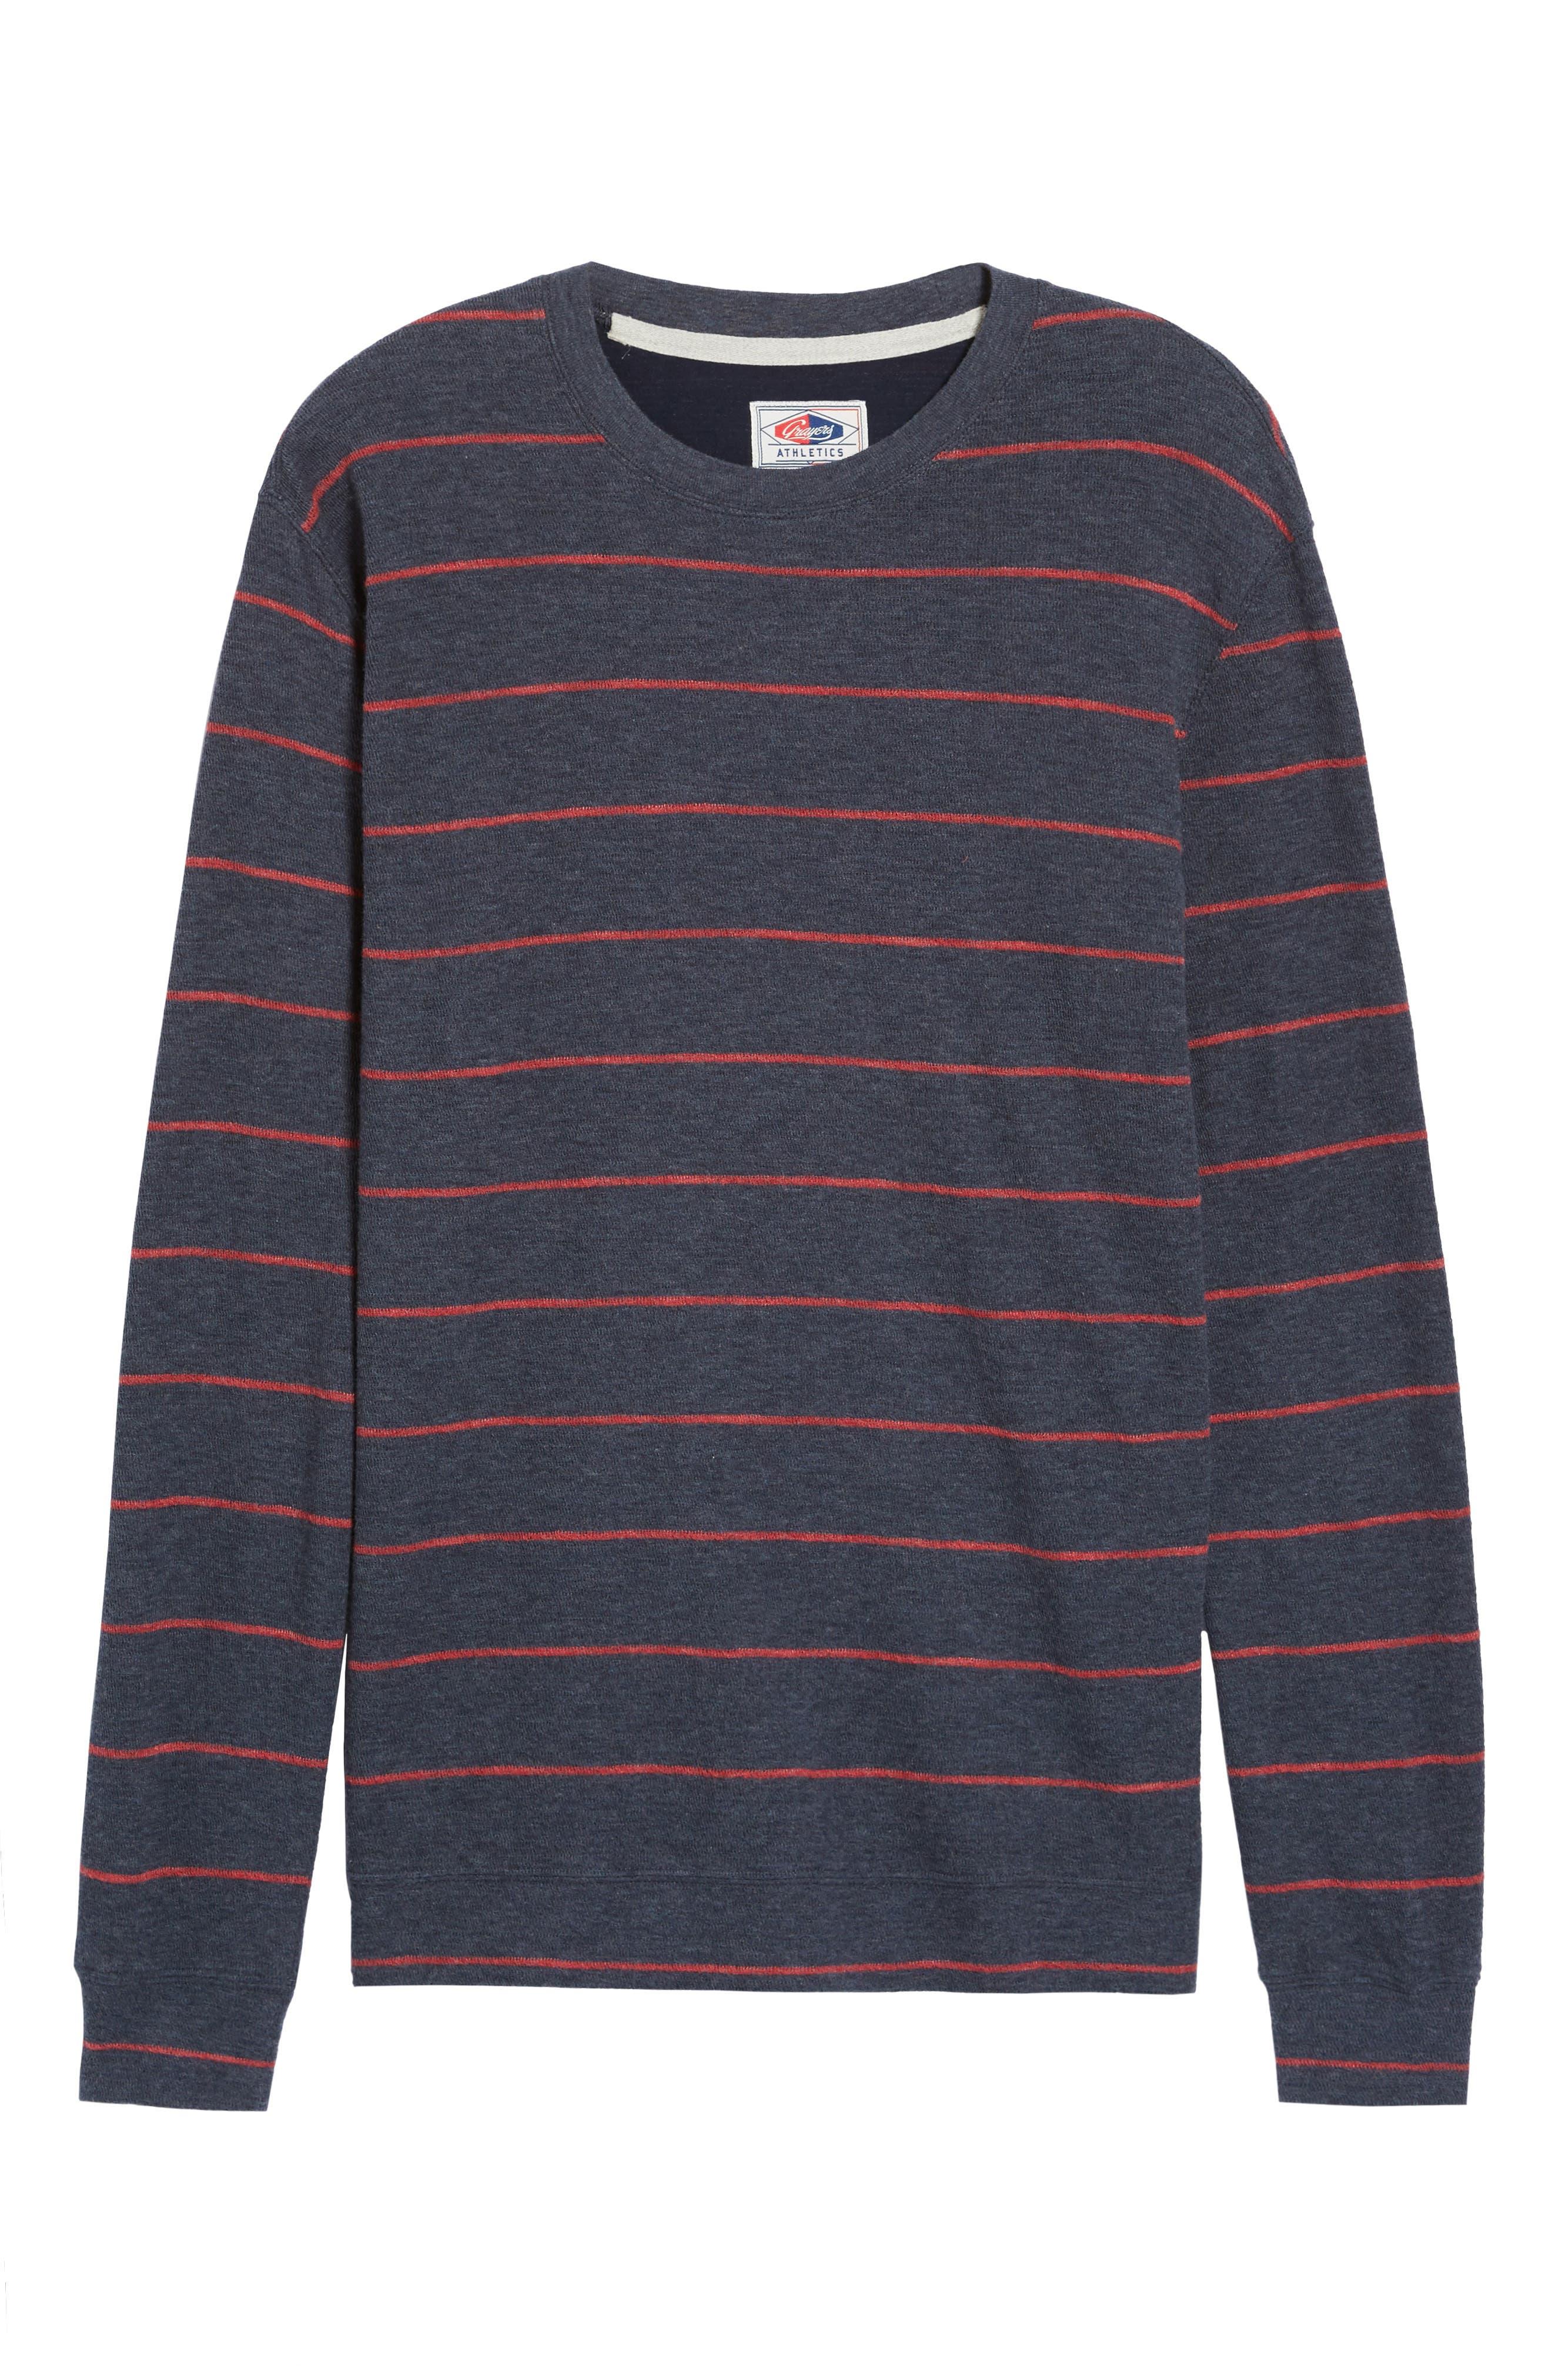 Baird Stripe Crewneck Sweatshirt,                             Alternate thumbnail 2, color,                             Navy / Red